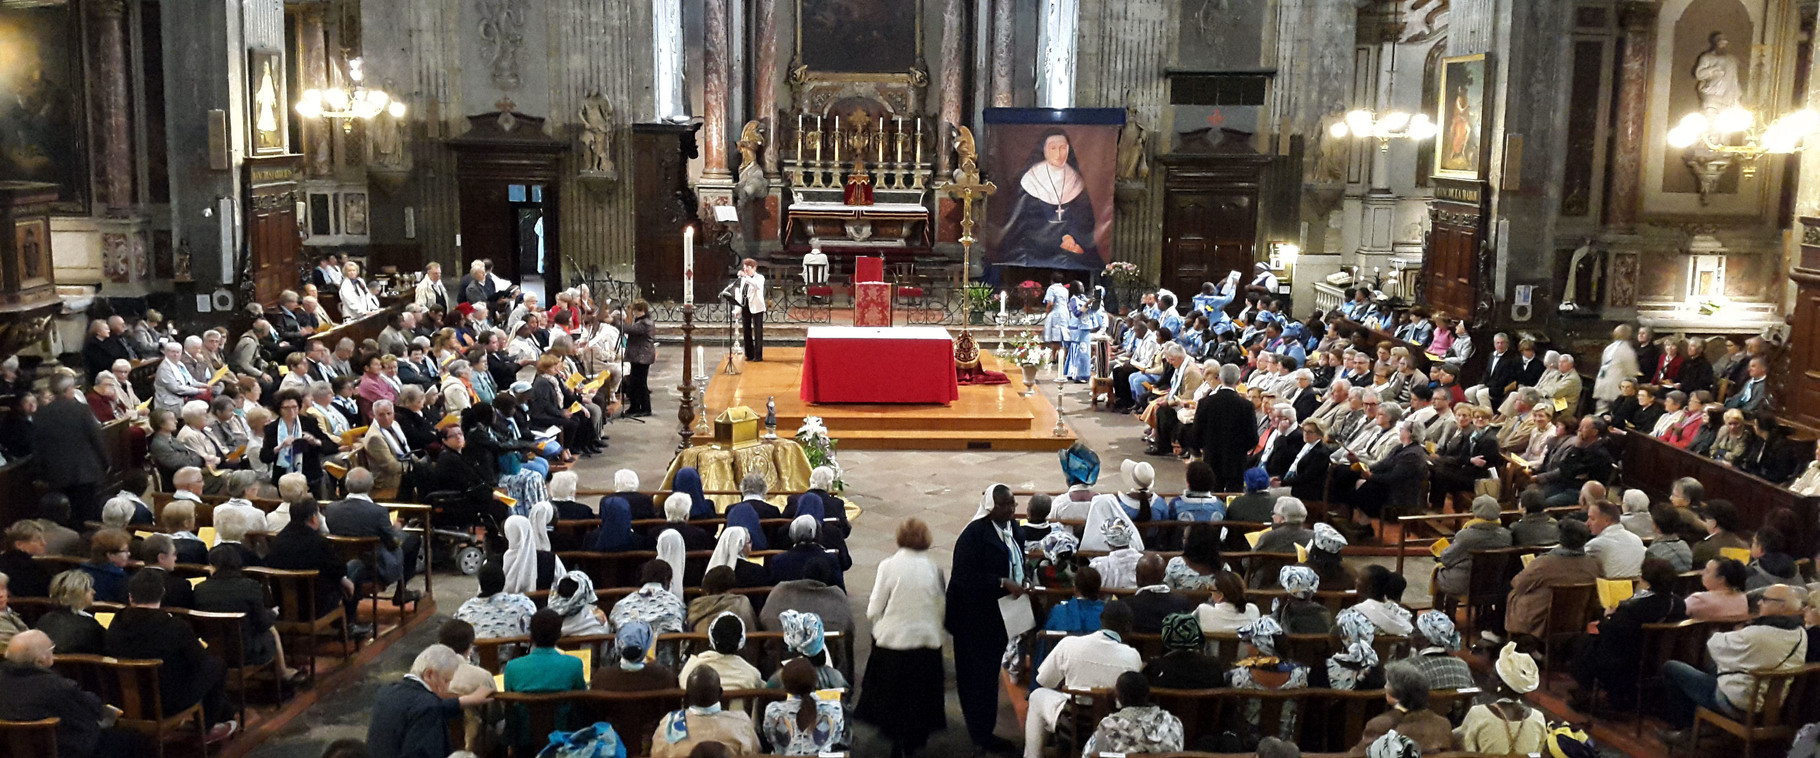 Misa en la Iglesia de Saint Benoît - Castres